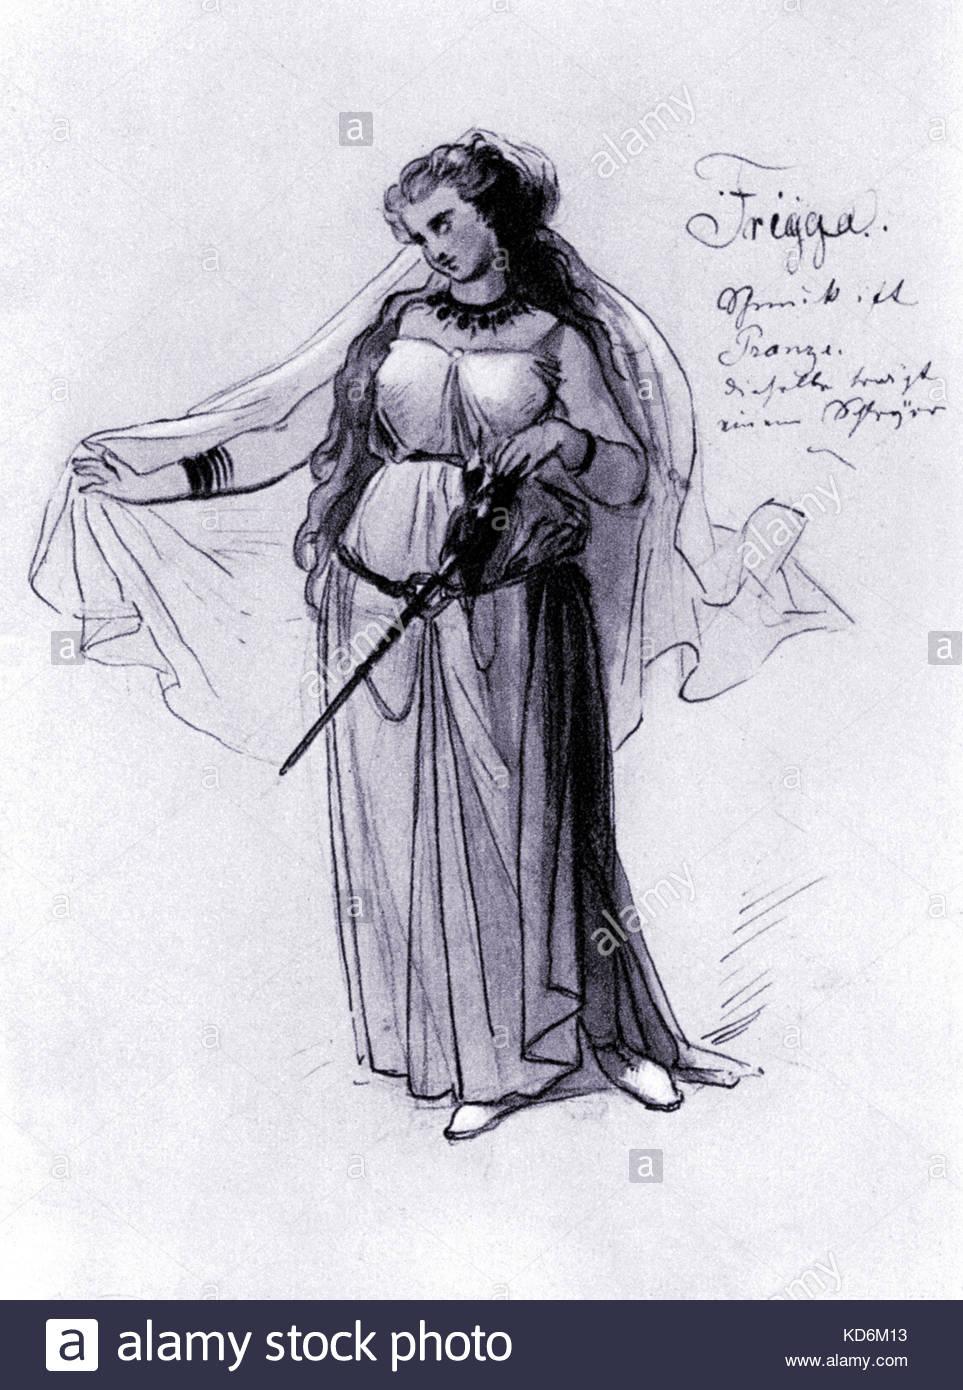 963x1390 19th Century Opera Singer Myth Drawing Art Artist Stock Photos